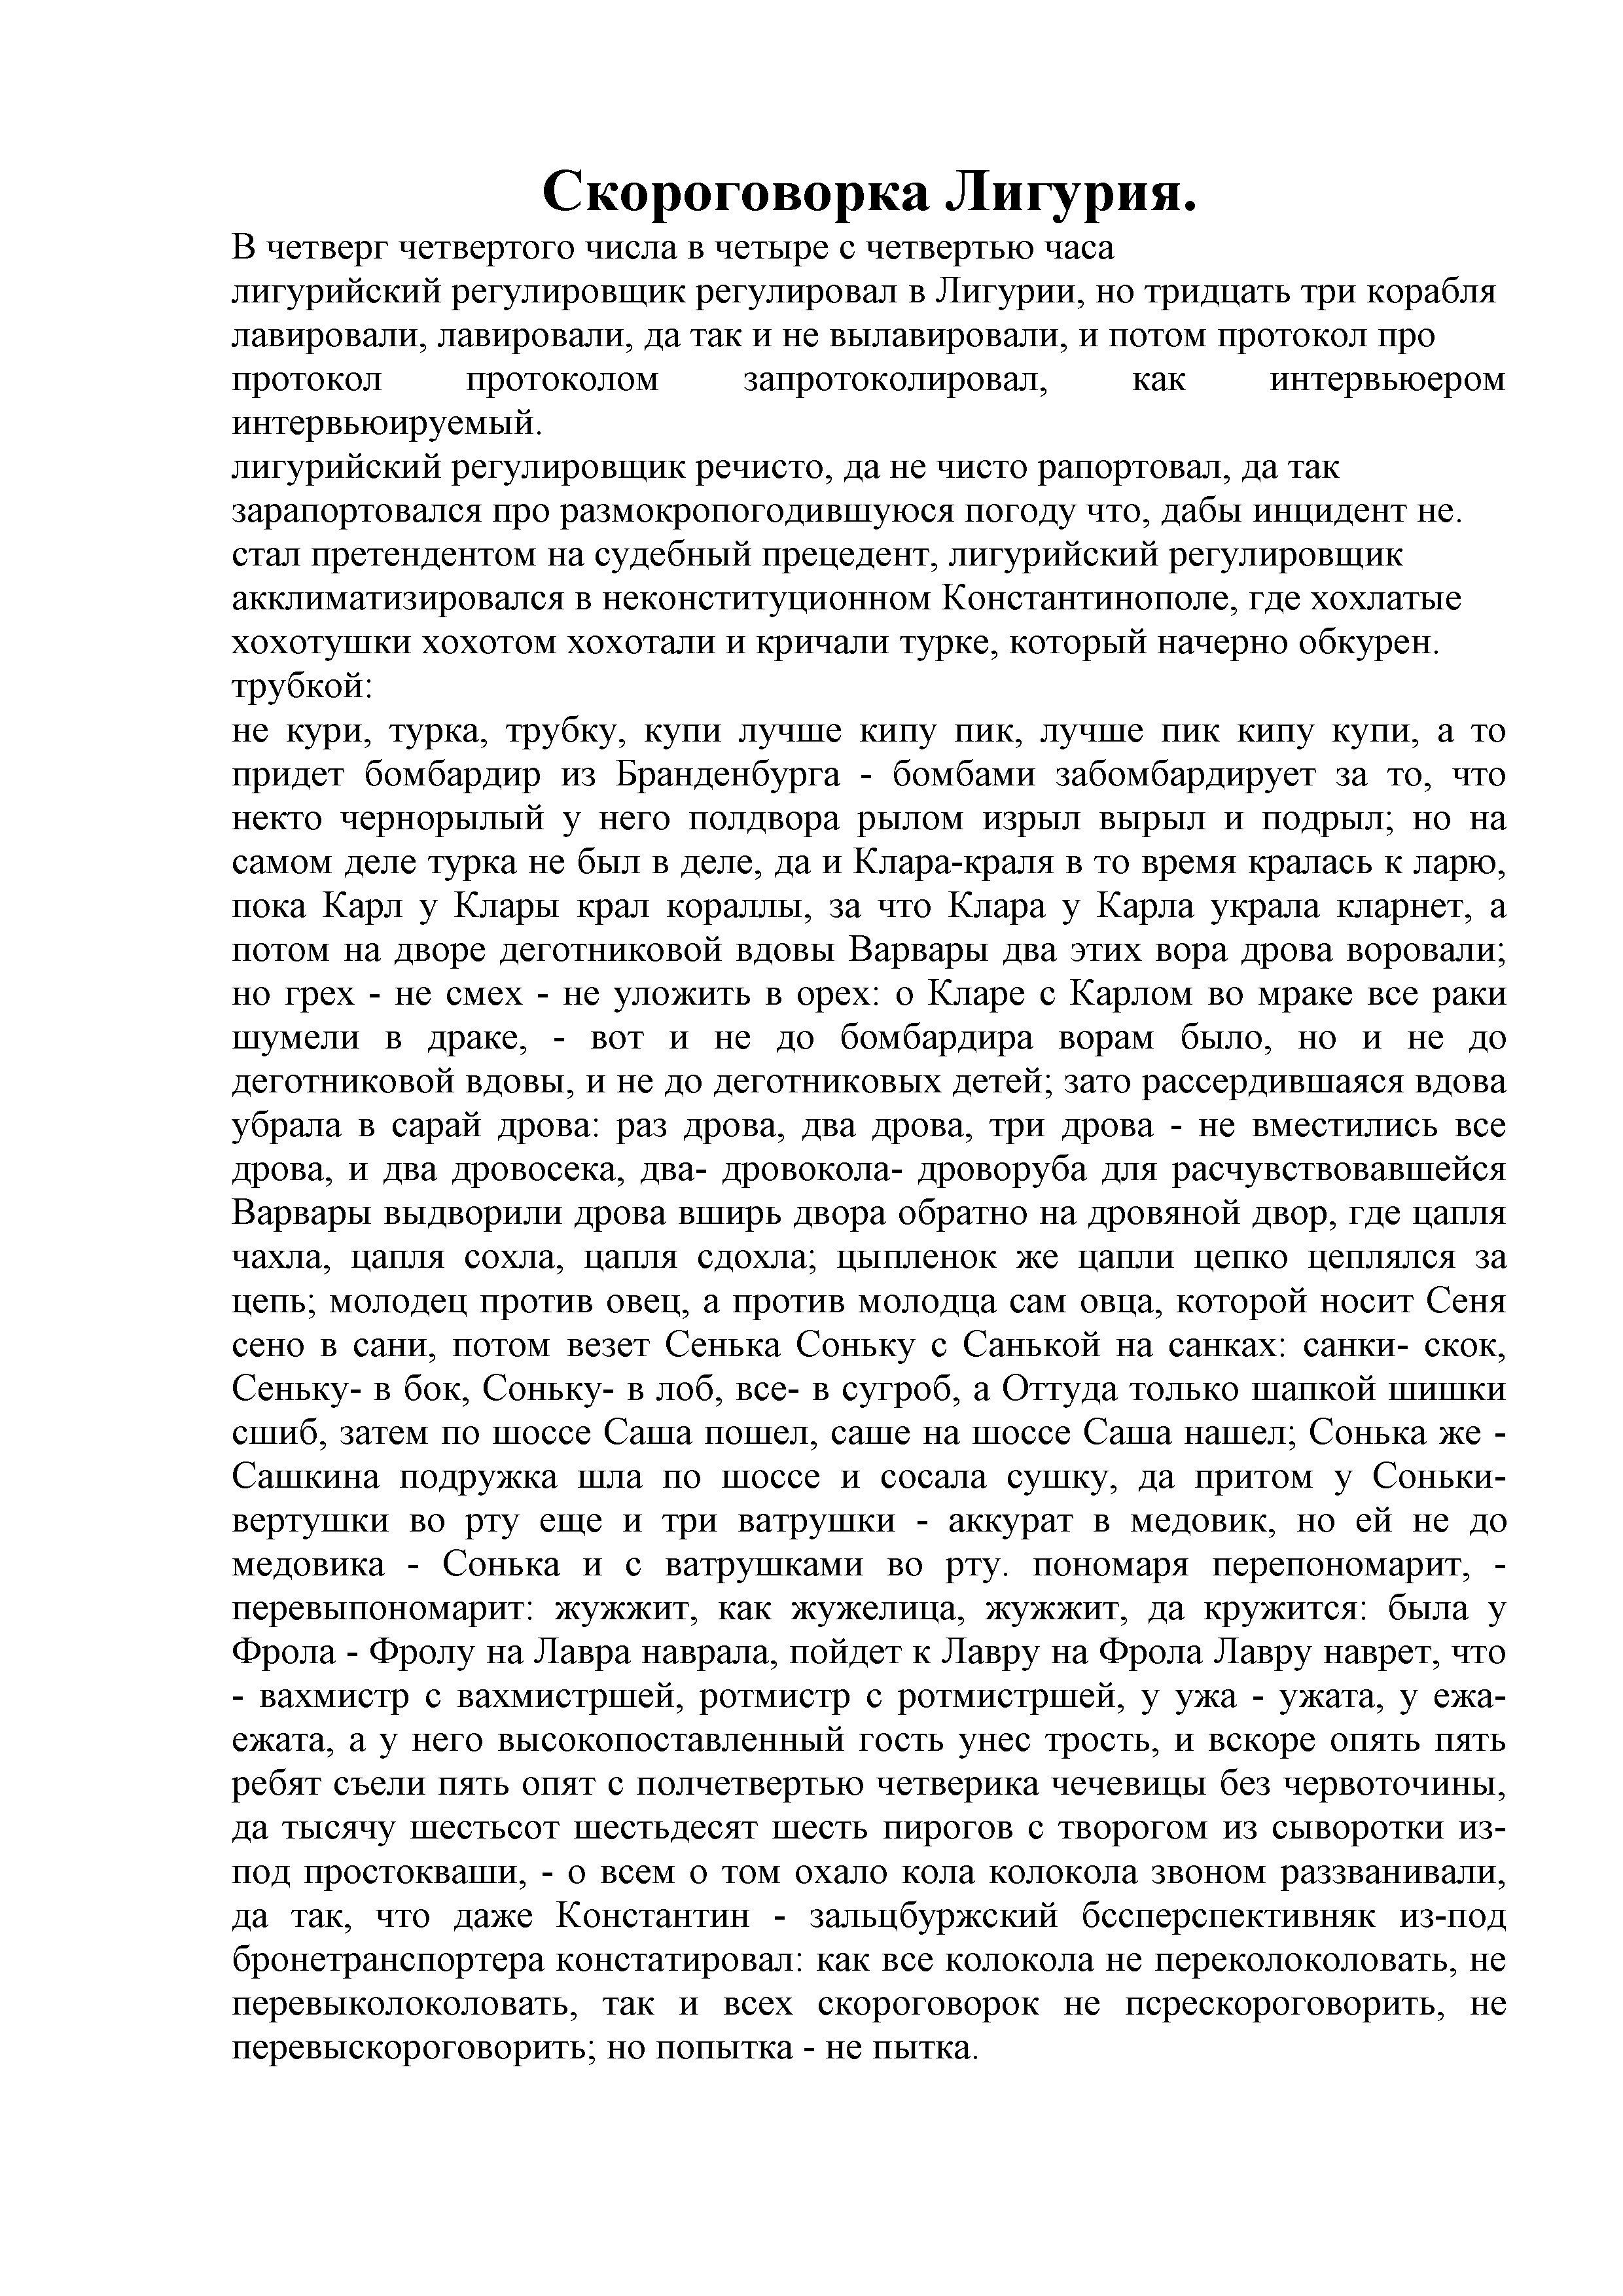 про скороговорка лигурия с ударениями Вакансии Монтажник Окон